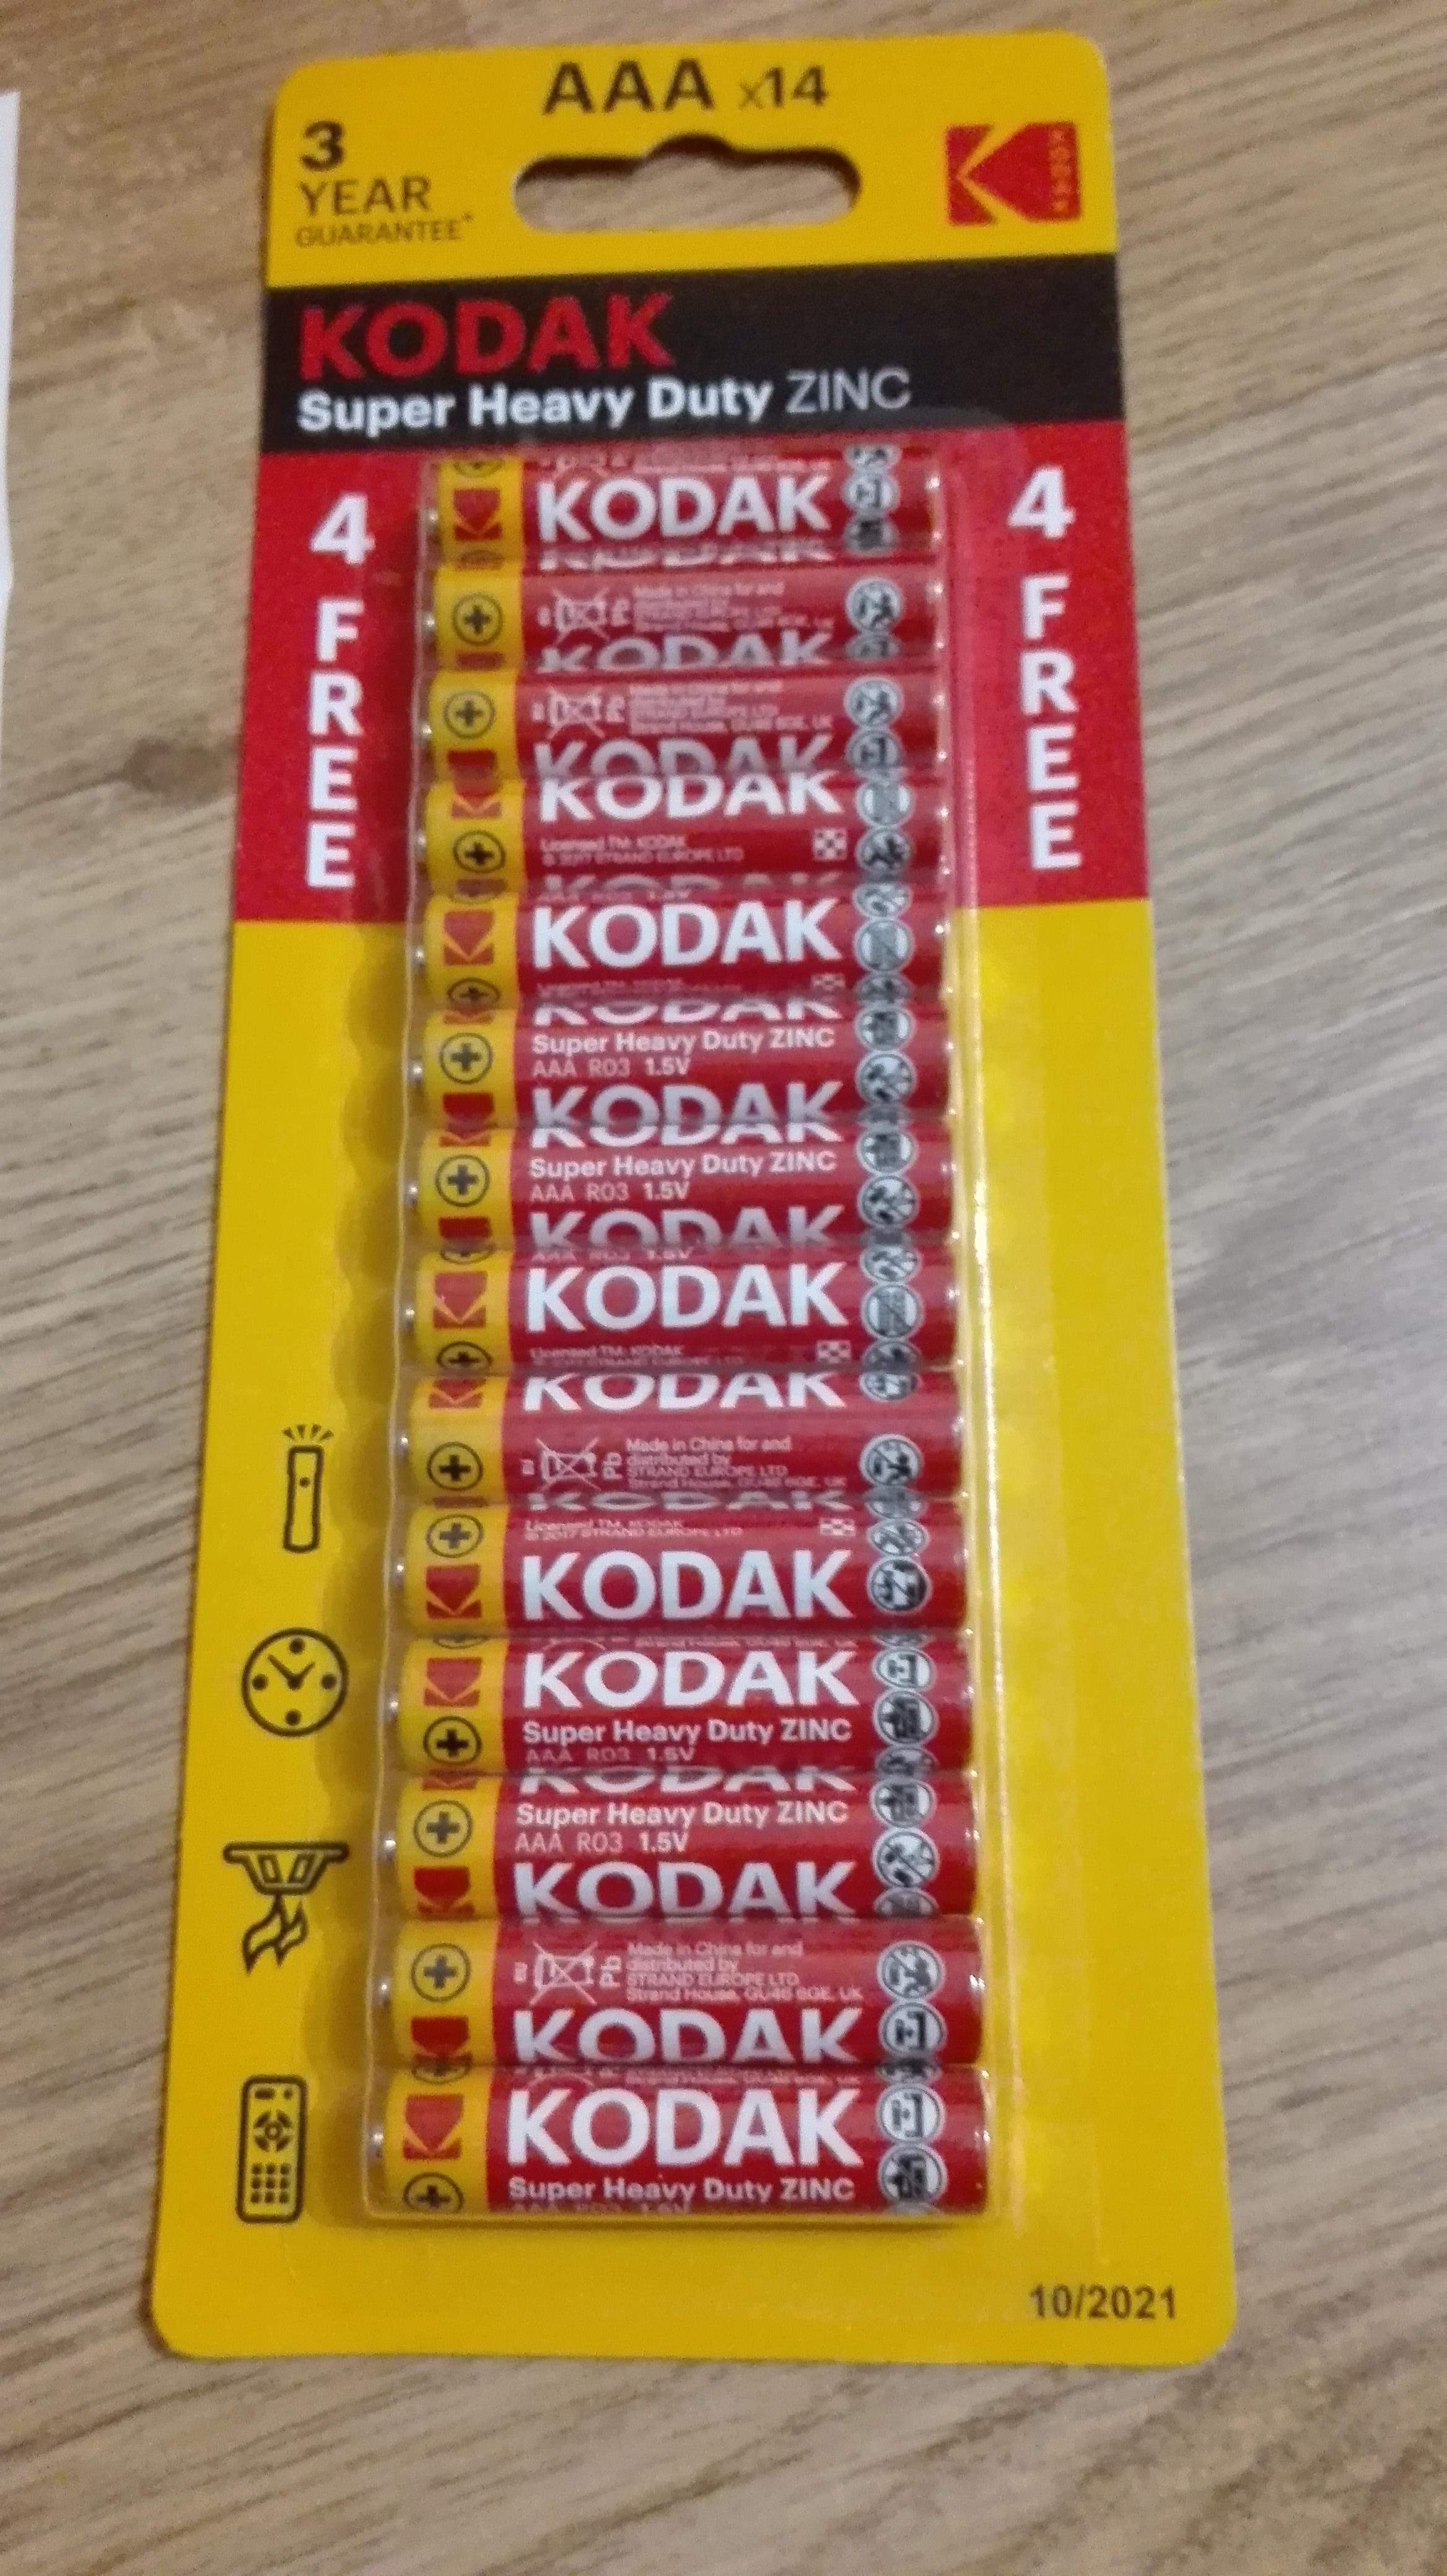 DEALZ baterie kodak 14 szt AAA